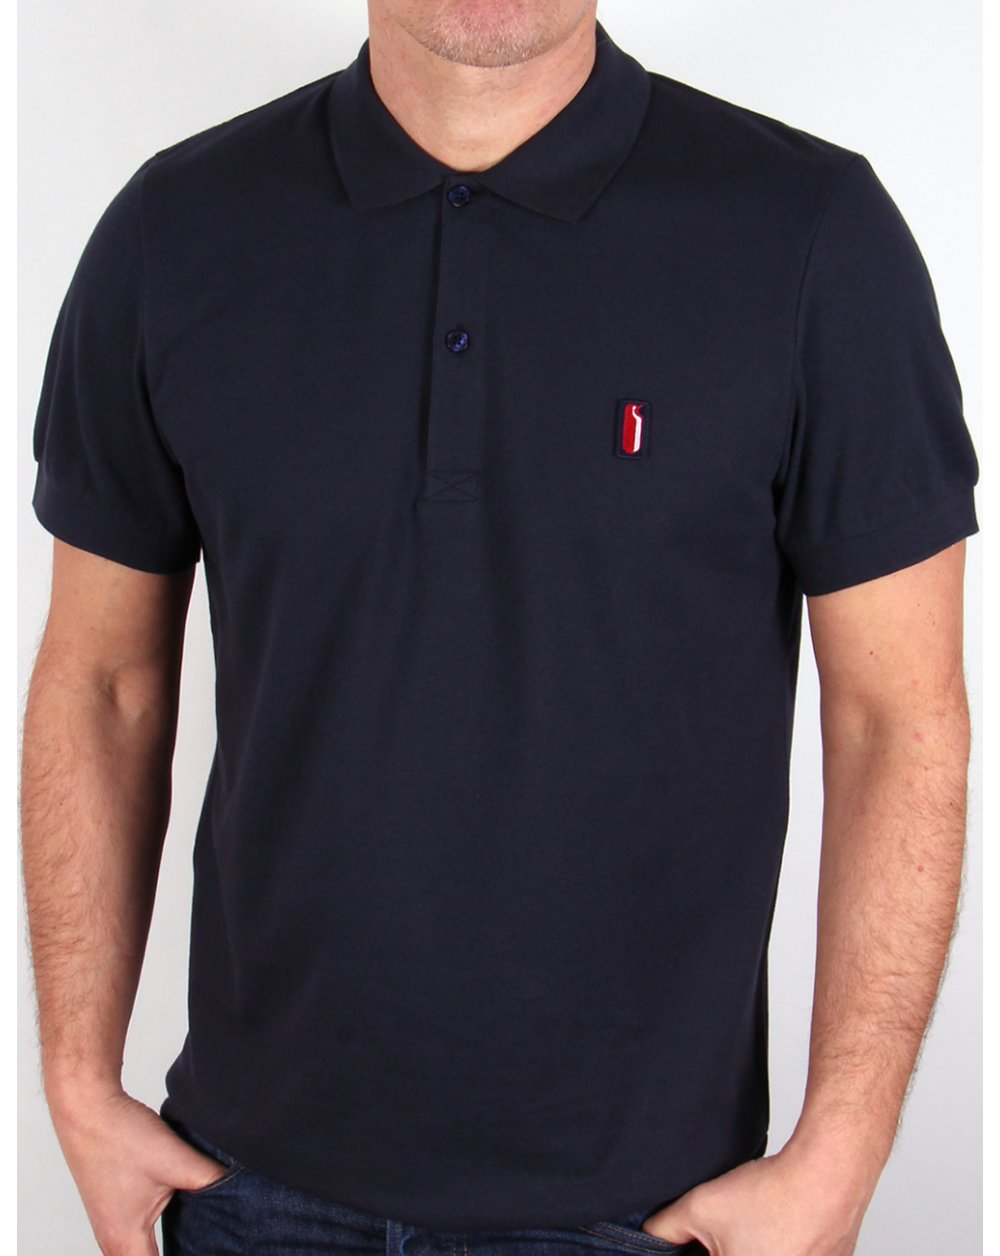 6febd2a220 Ellesse Penguin Polo Shirt Navy Blue